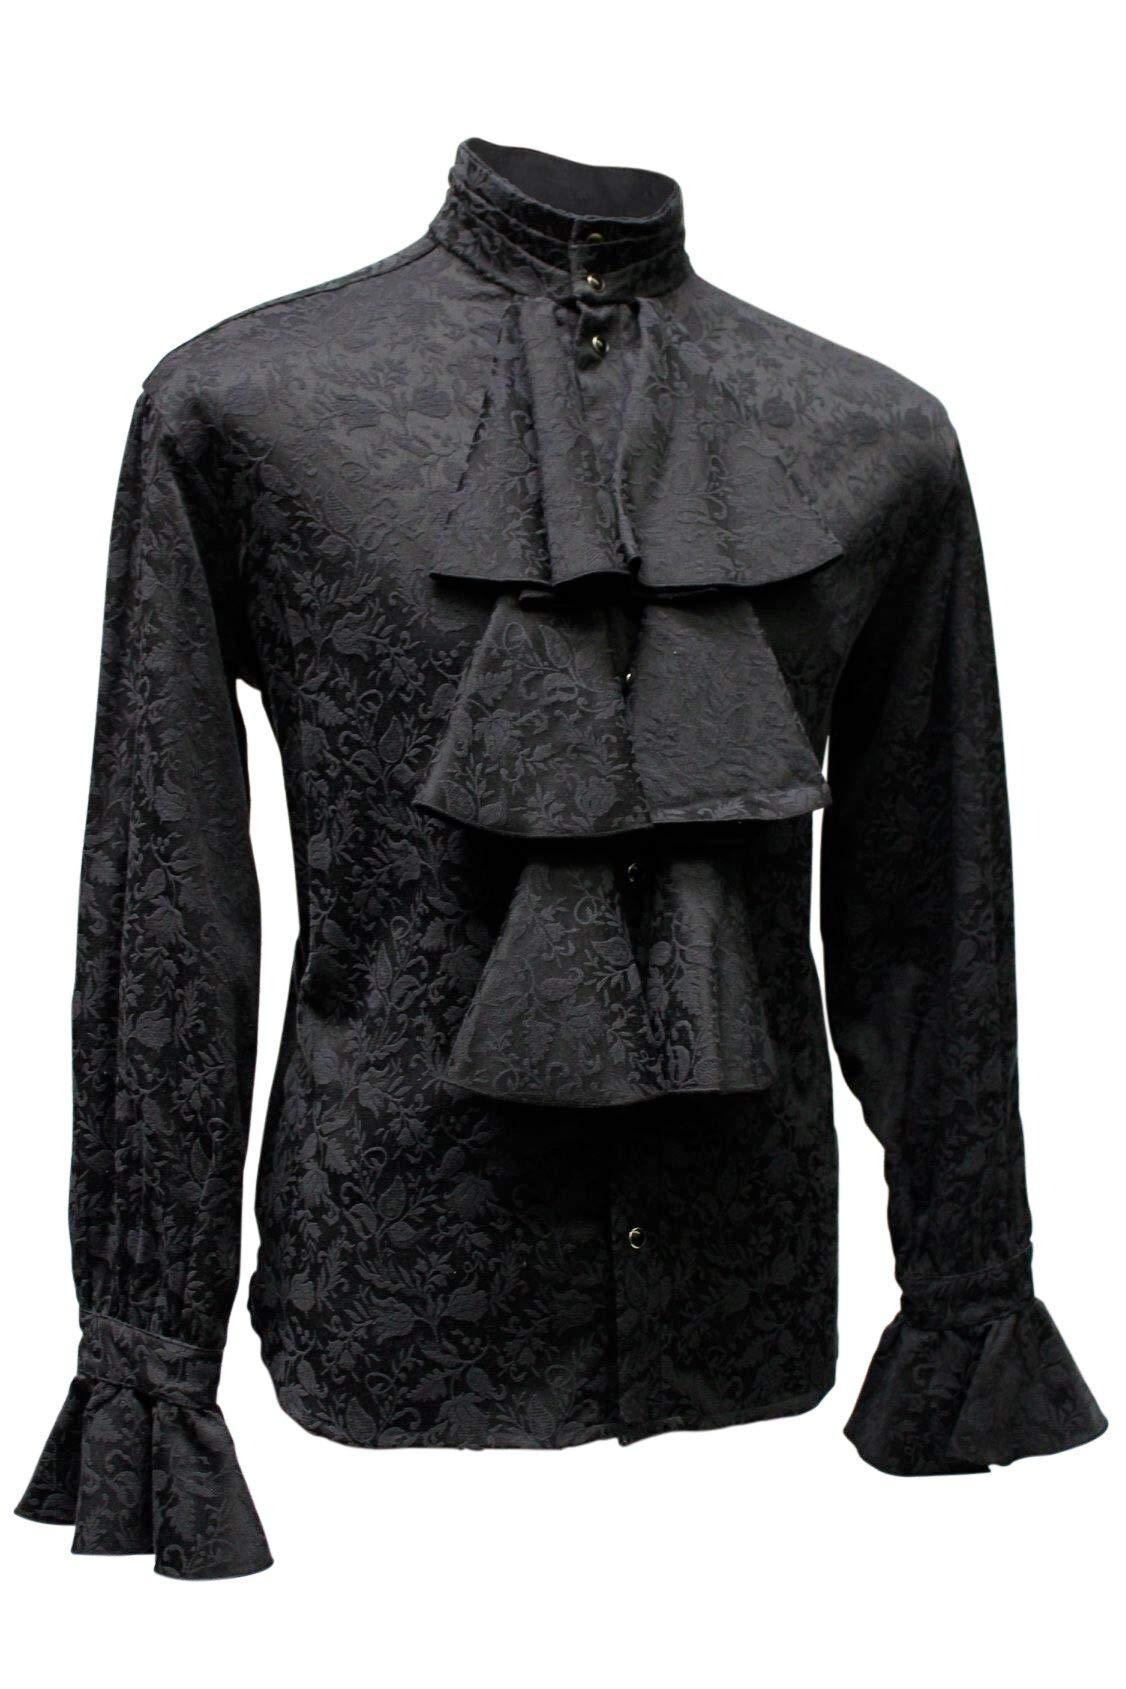 Shrine Men's Formal Victorian Gothic Steampunk Pirate Louis XIV Shirt Black Jacquard (XL) by Shrine Of Hollywood